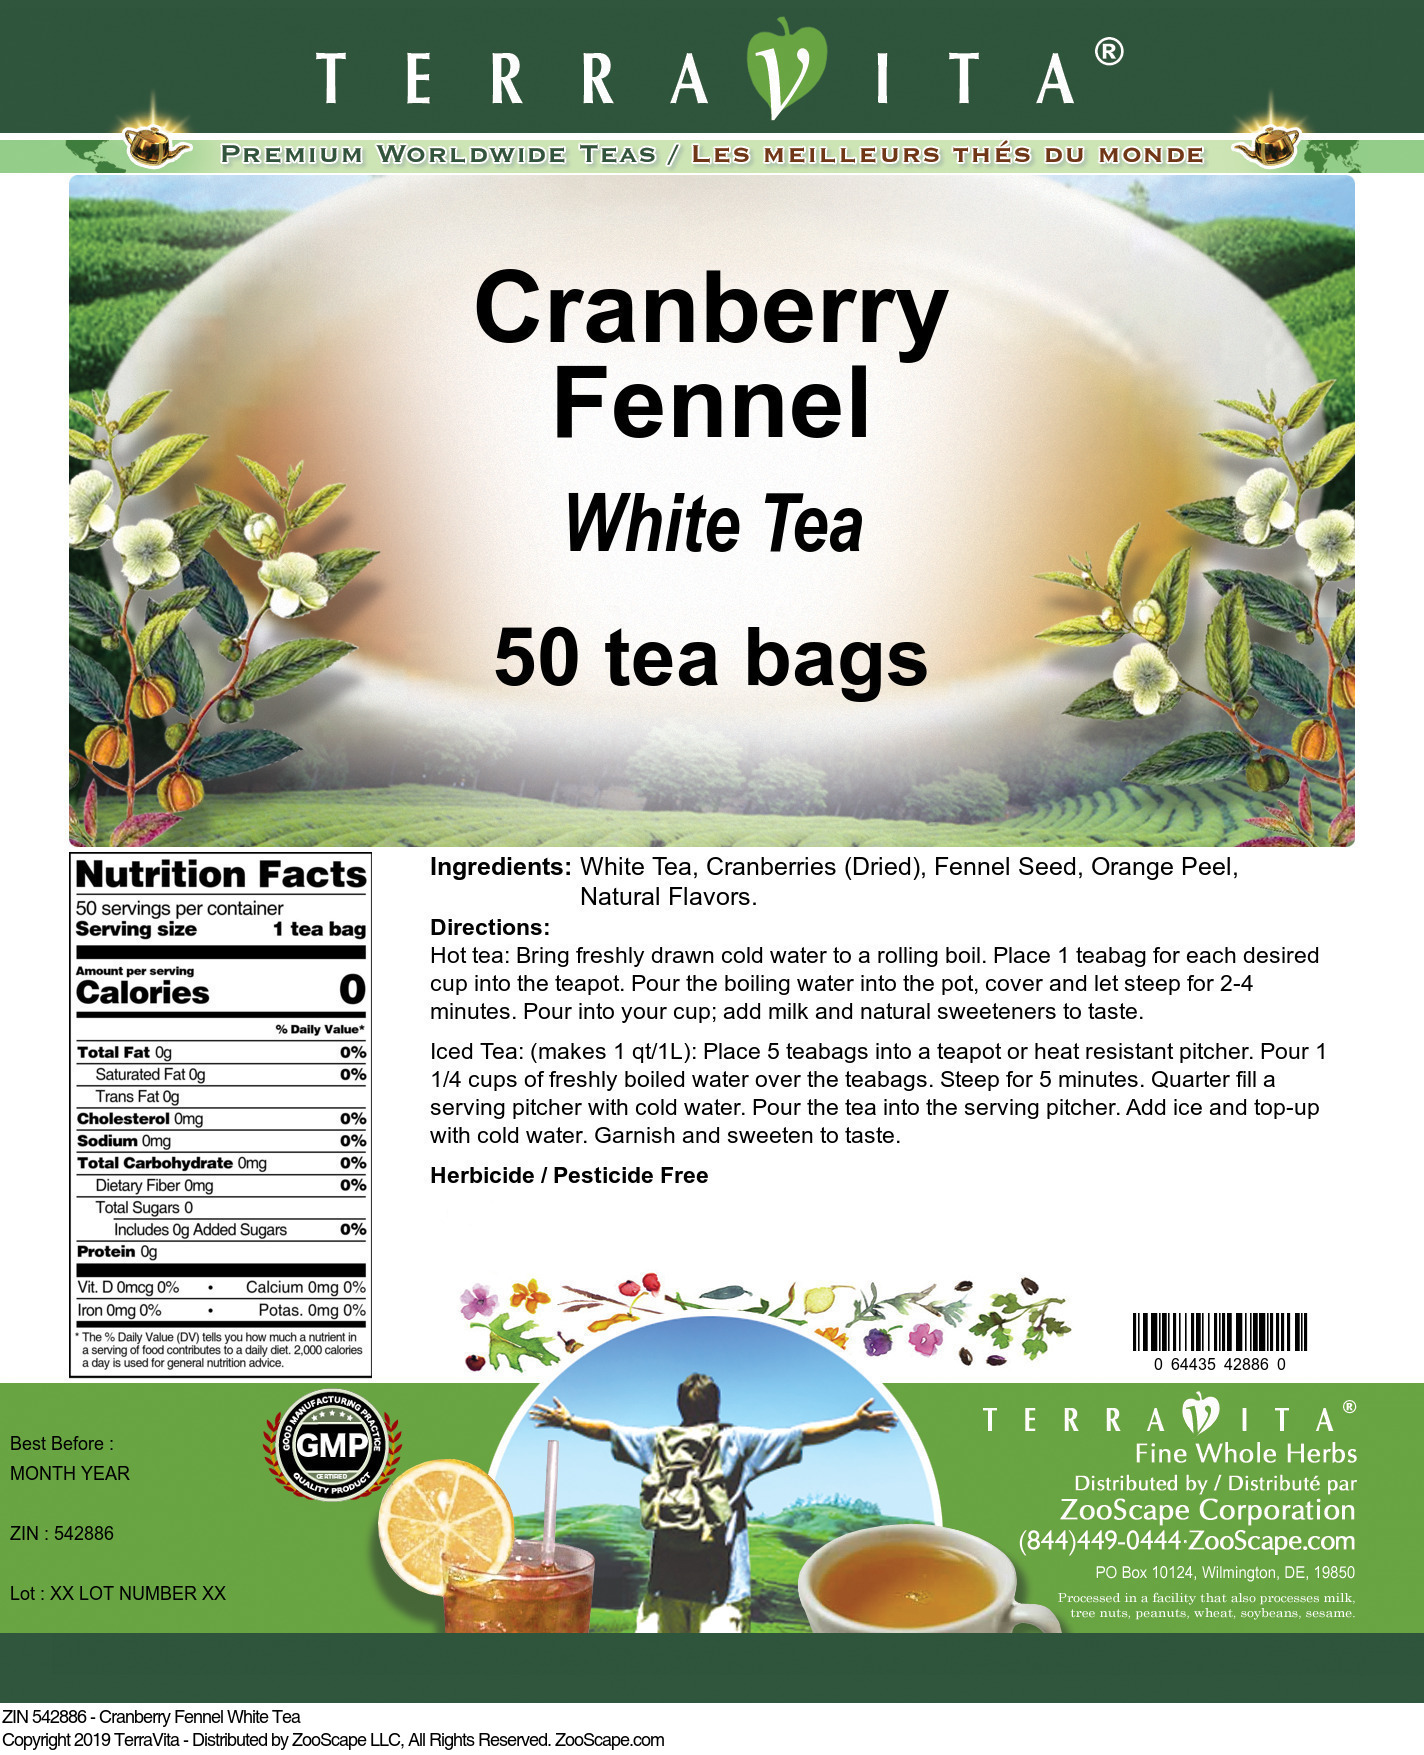 Cranberry Fennel White Tea